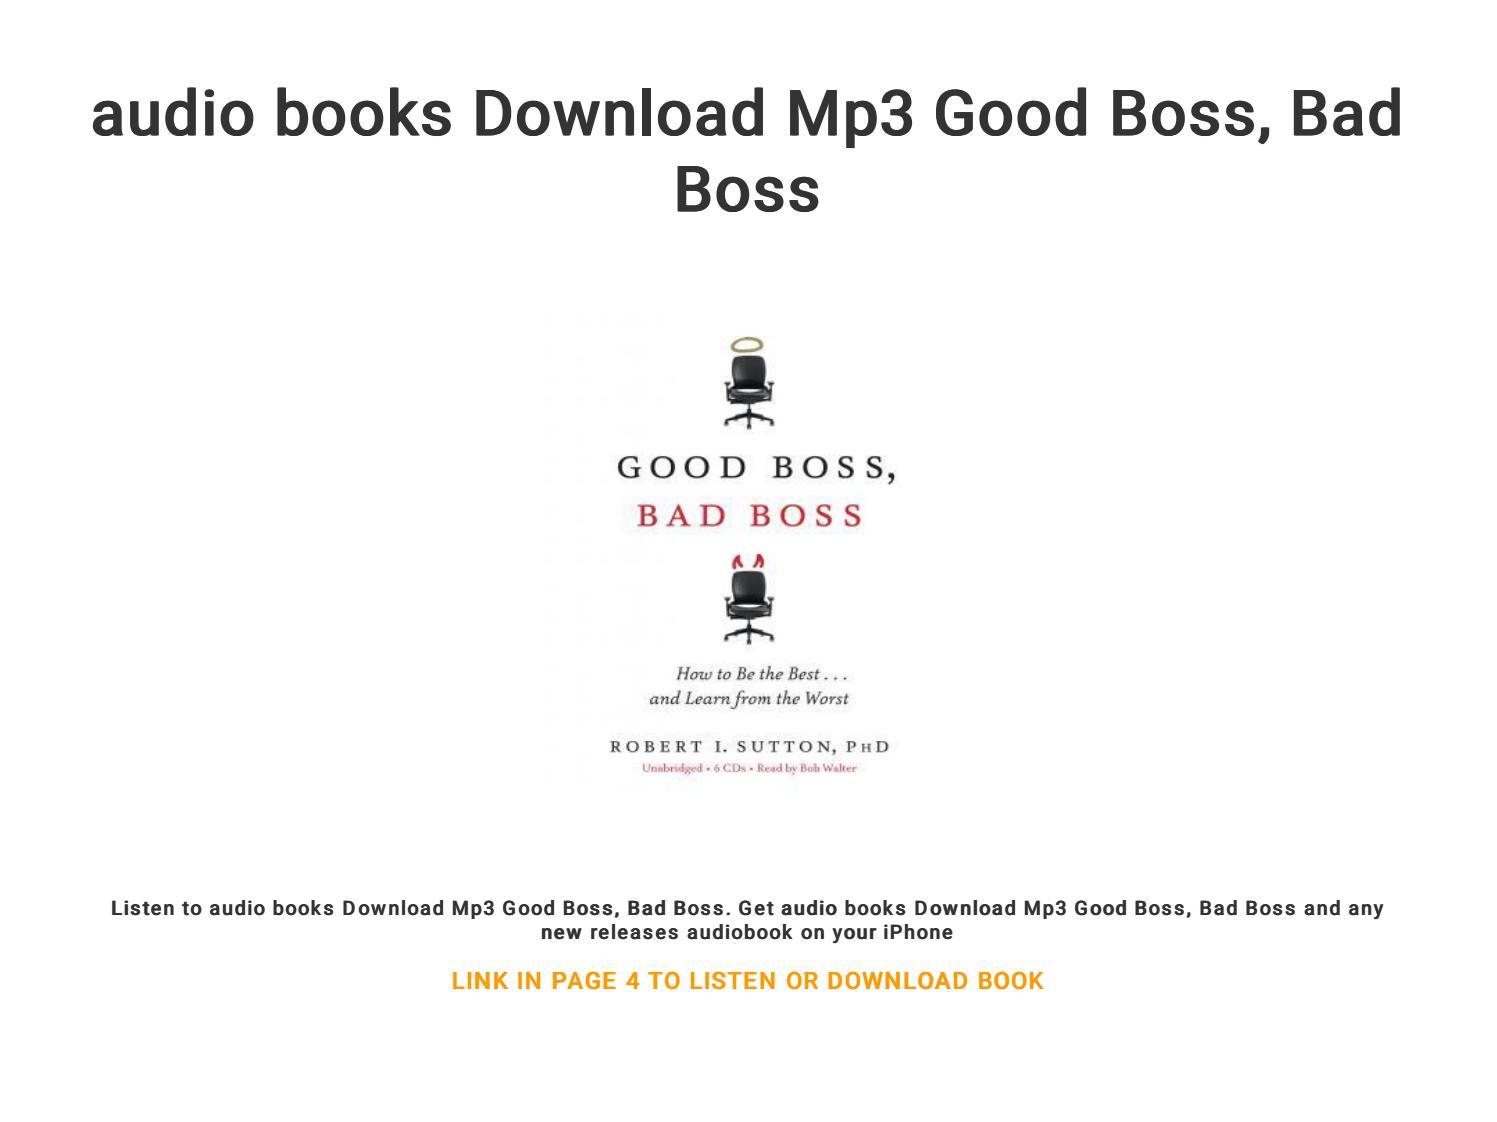 audio books Download Mp3 Good Boss, Bad Boss by winve1949